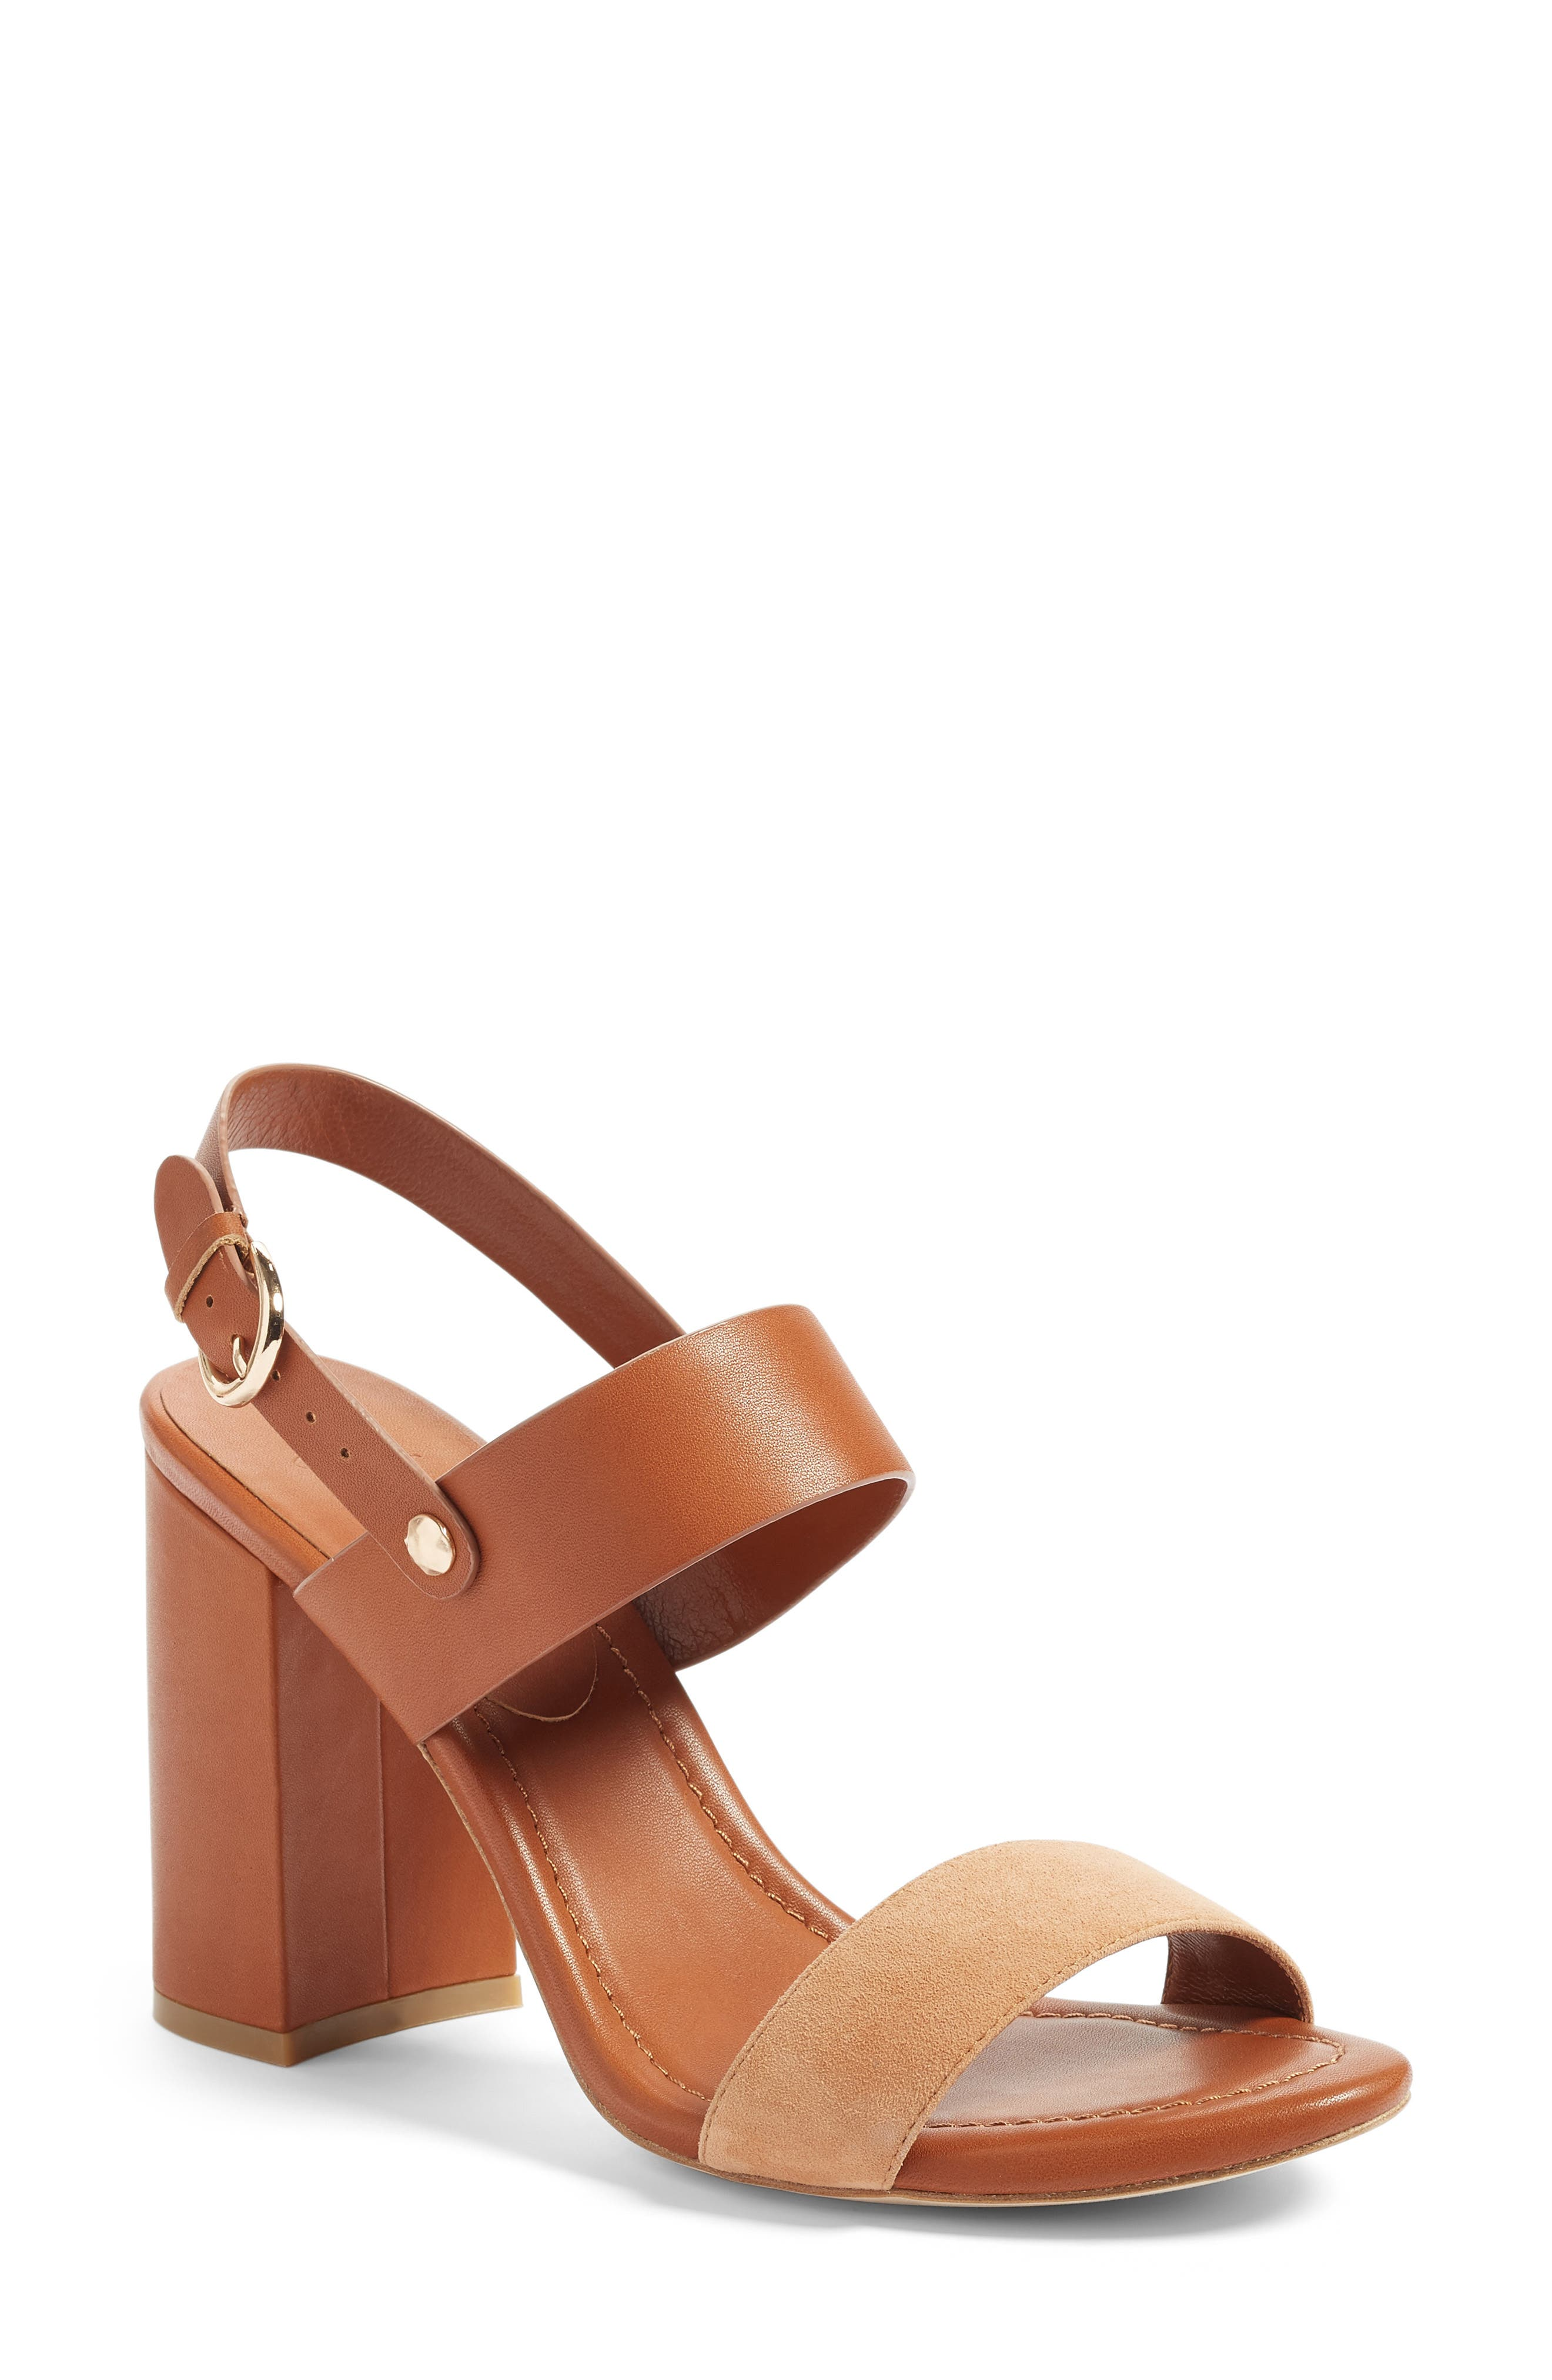 Lakin Slingback Sandal,                         Main,                         color, 248